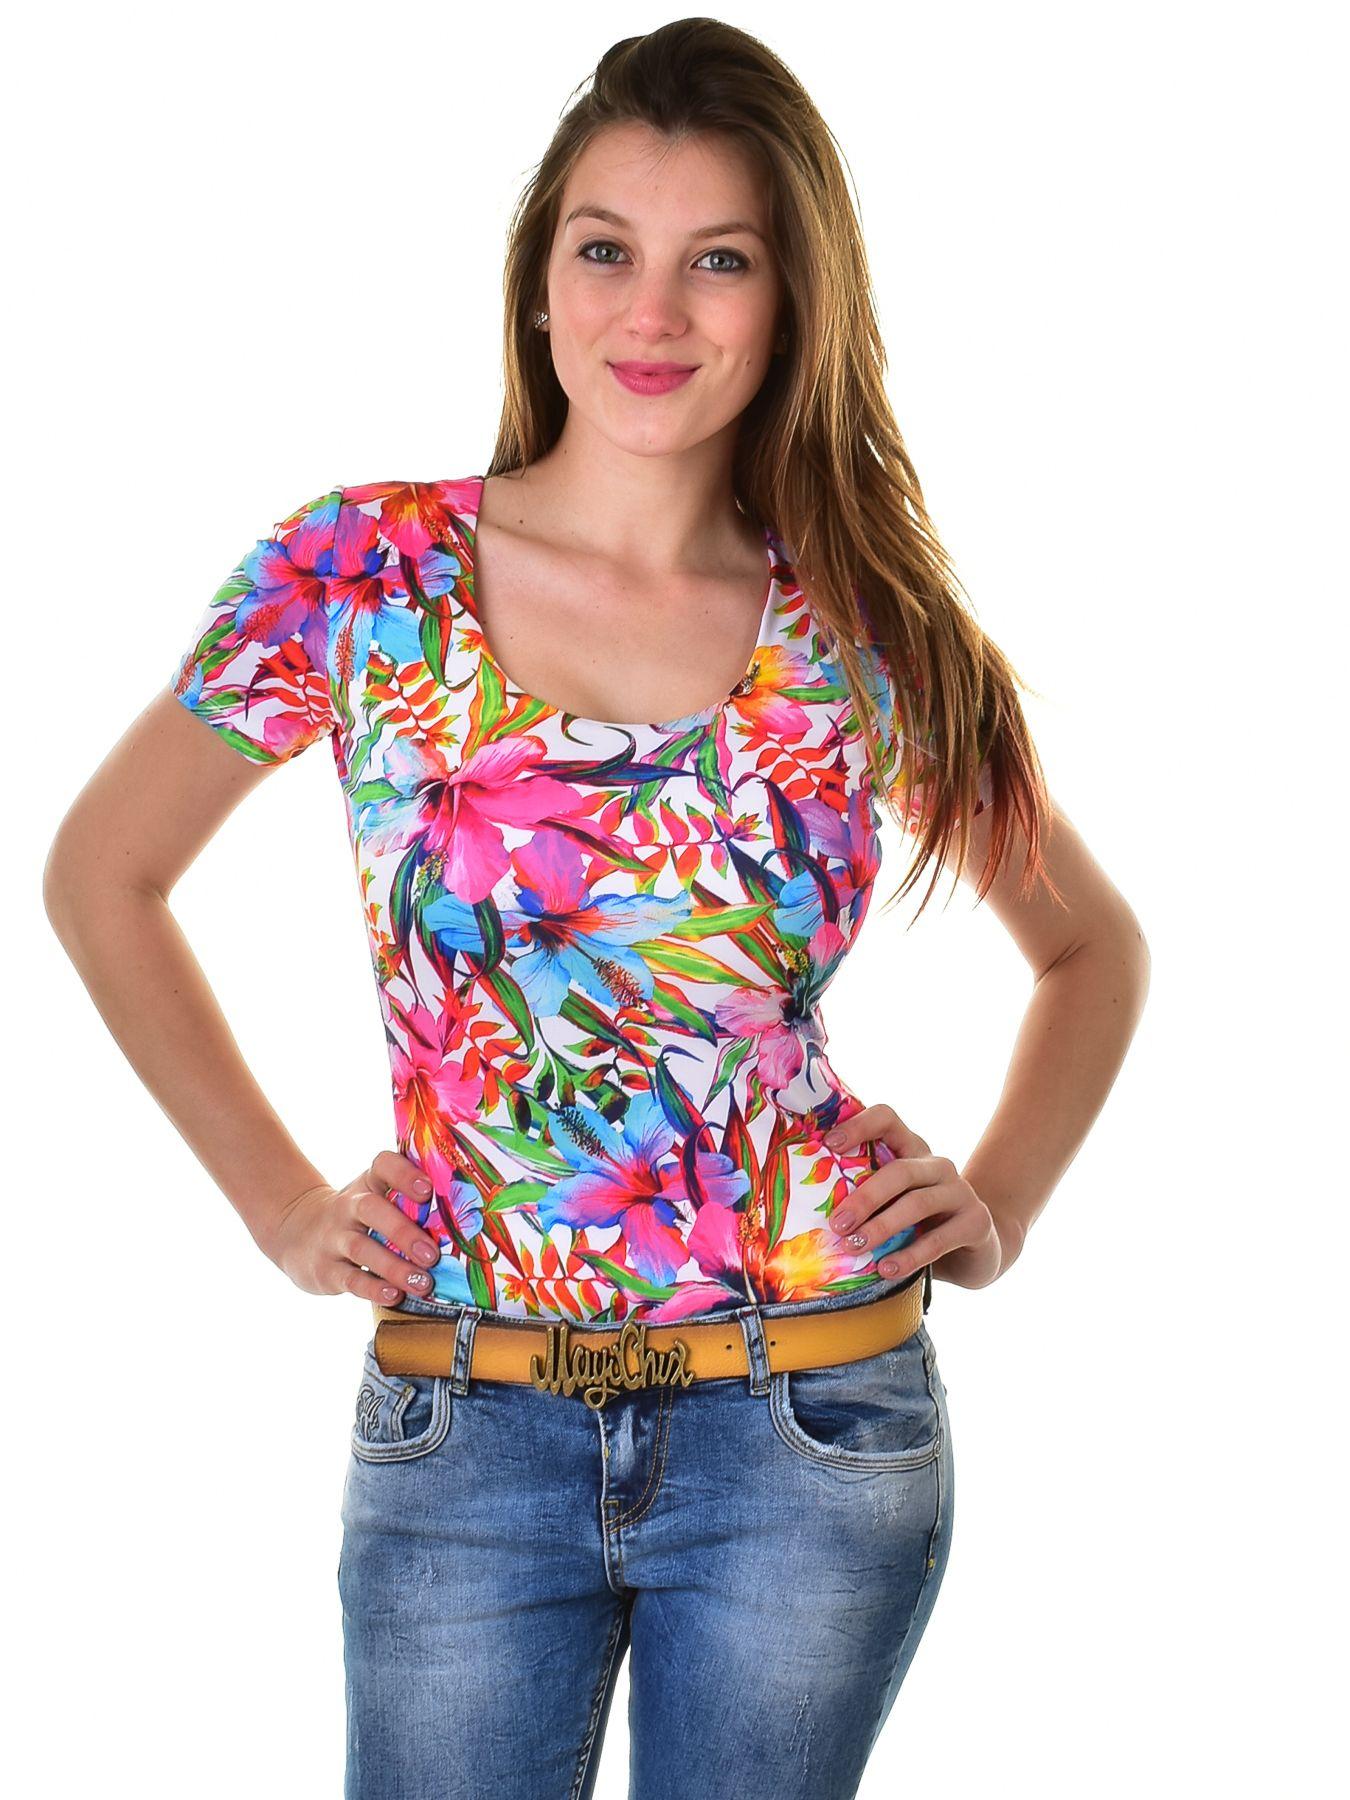 4fb76d5177 Mayo Chix női rövid ujjú body TONDO | Markasbolt.hu Hivatalos Mayo ...